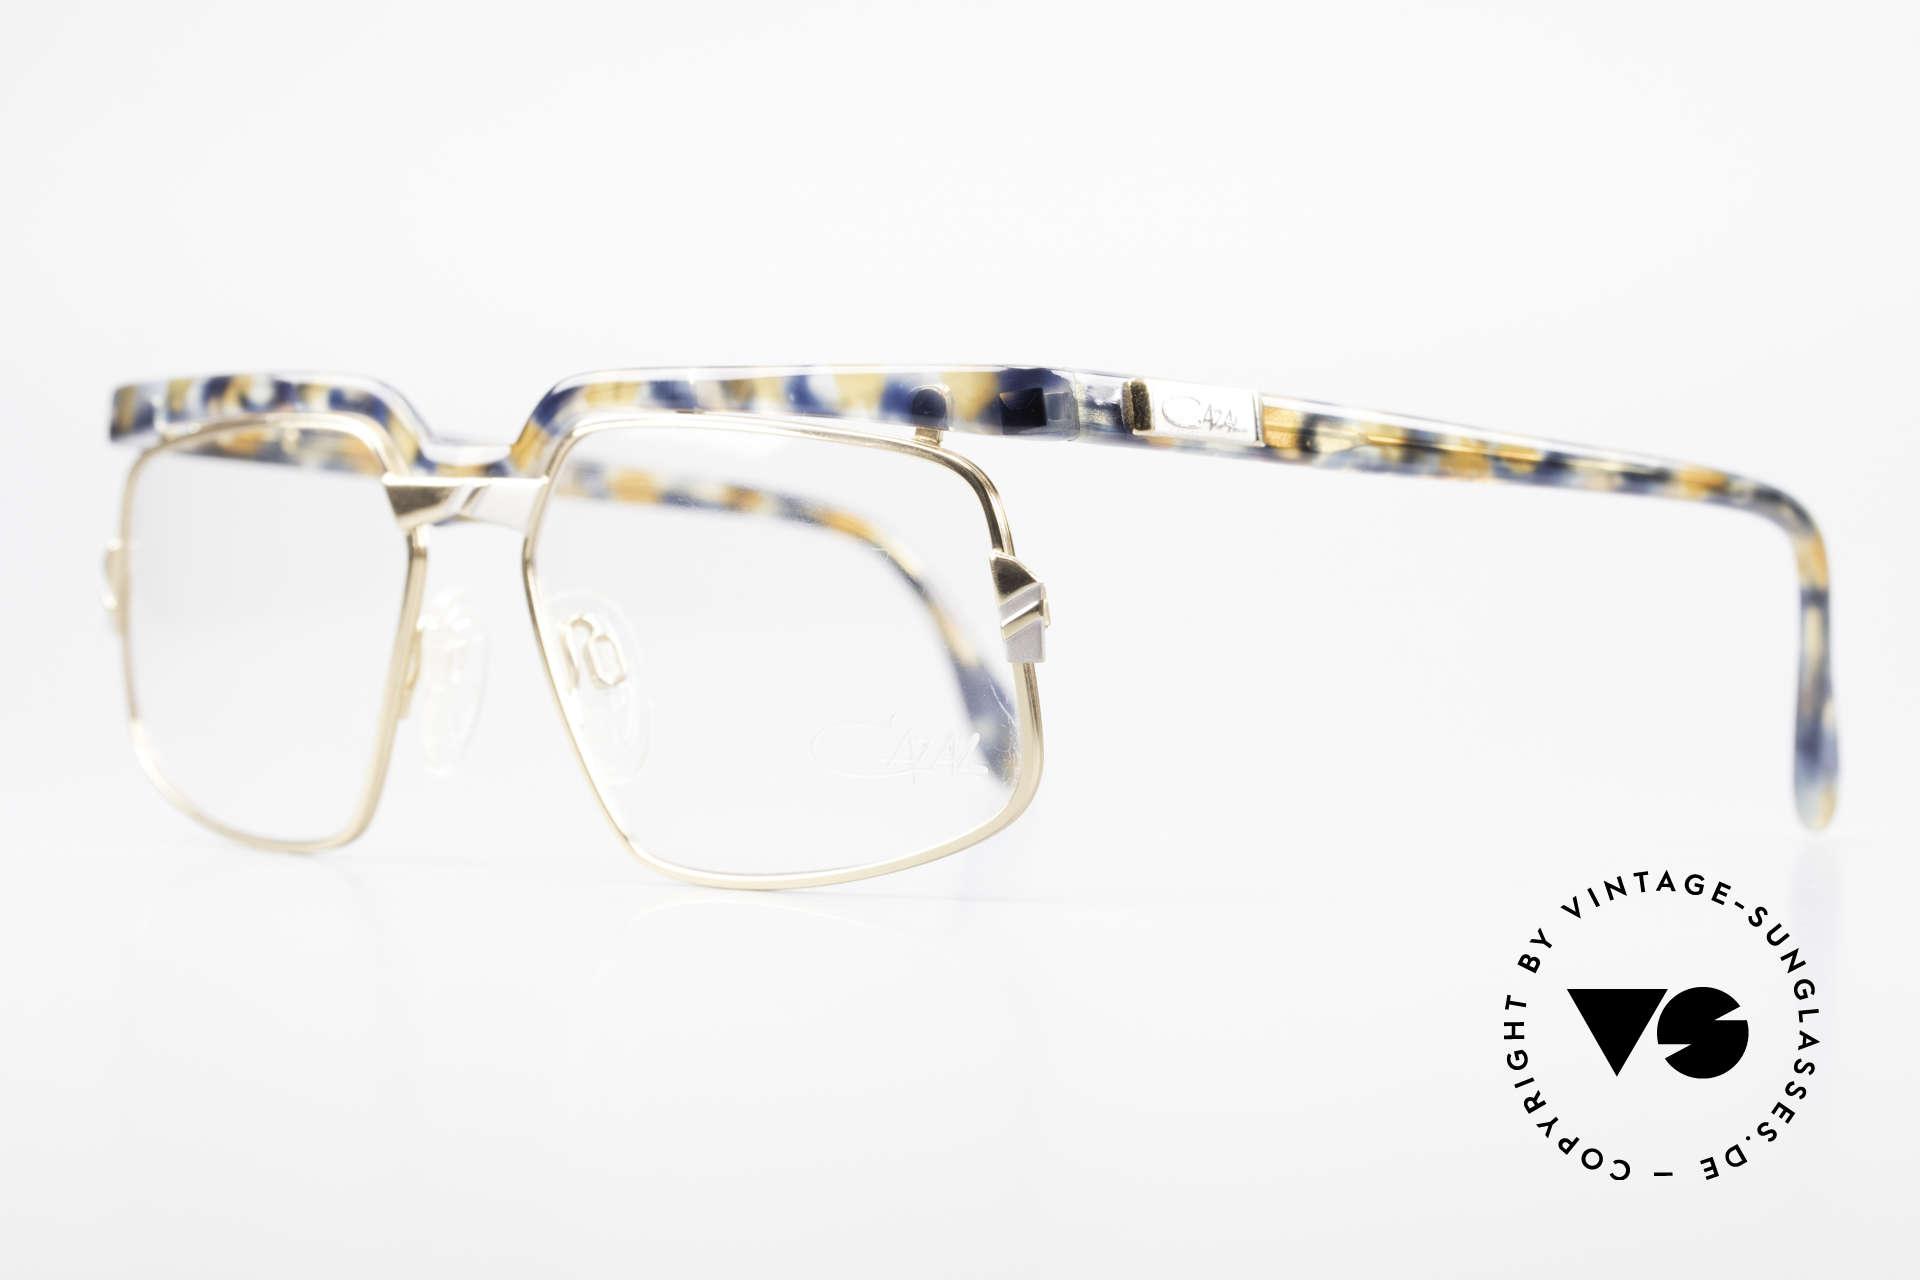 Cazal 246 Extraordinary Vintage Glasses, extraordinary designer piece (distinctive Cazal), Made for Men and Women